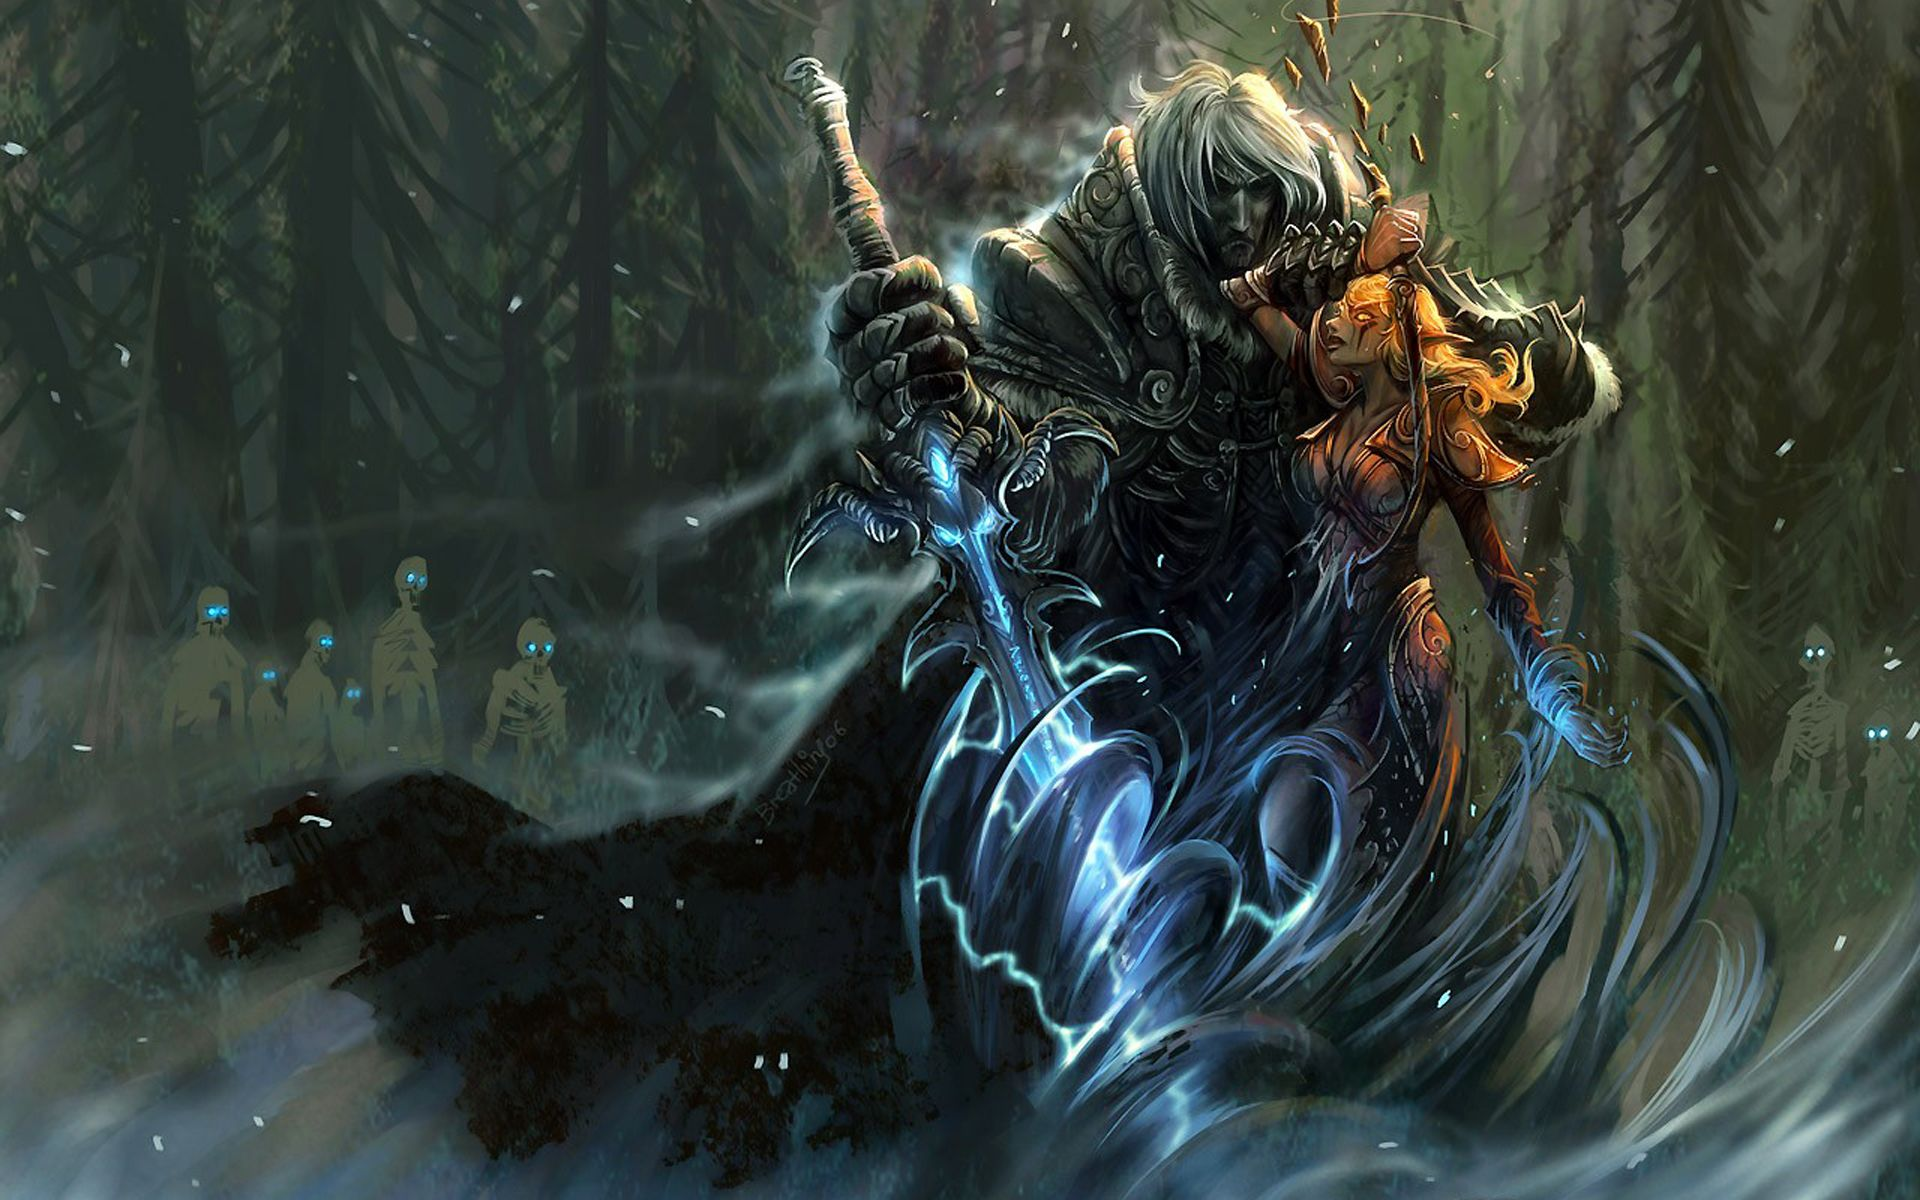 Video Game   World Of Warcraft Game Warrior Sword Wallpaper 1920x1200